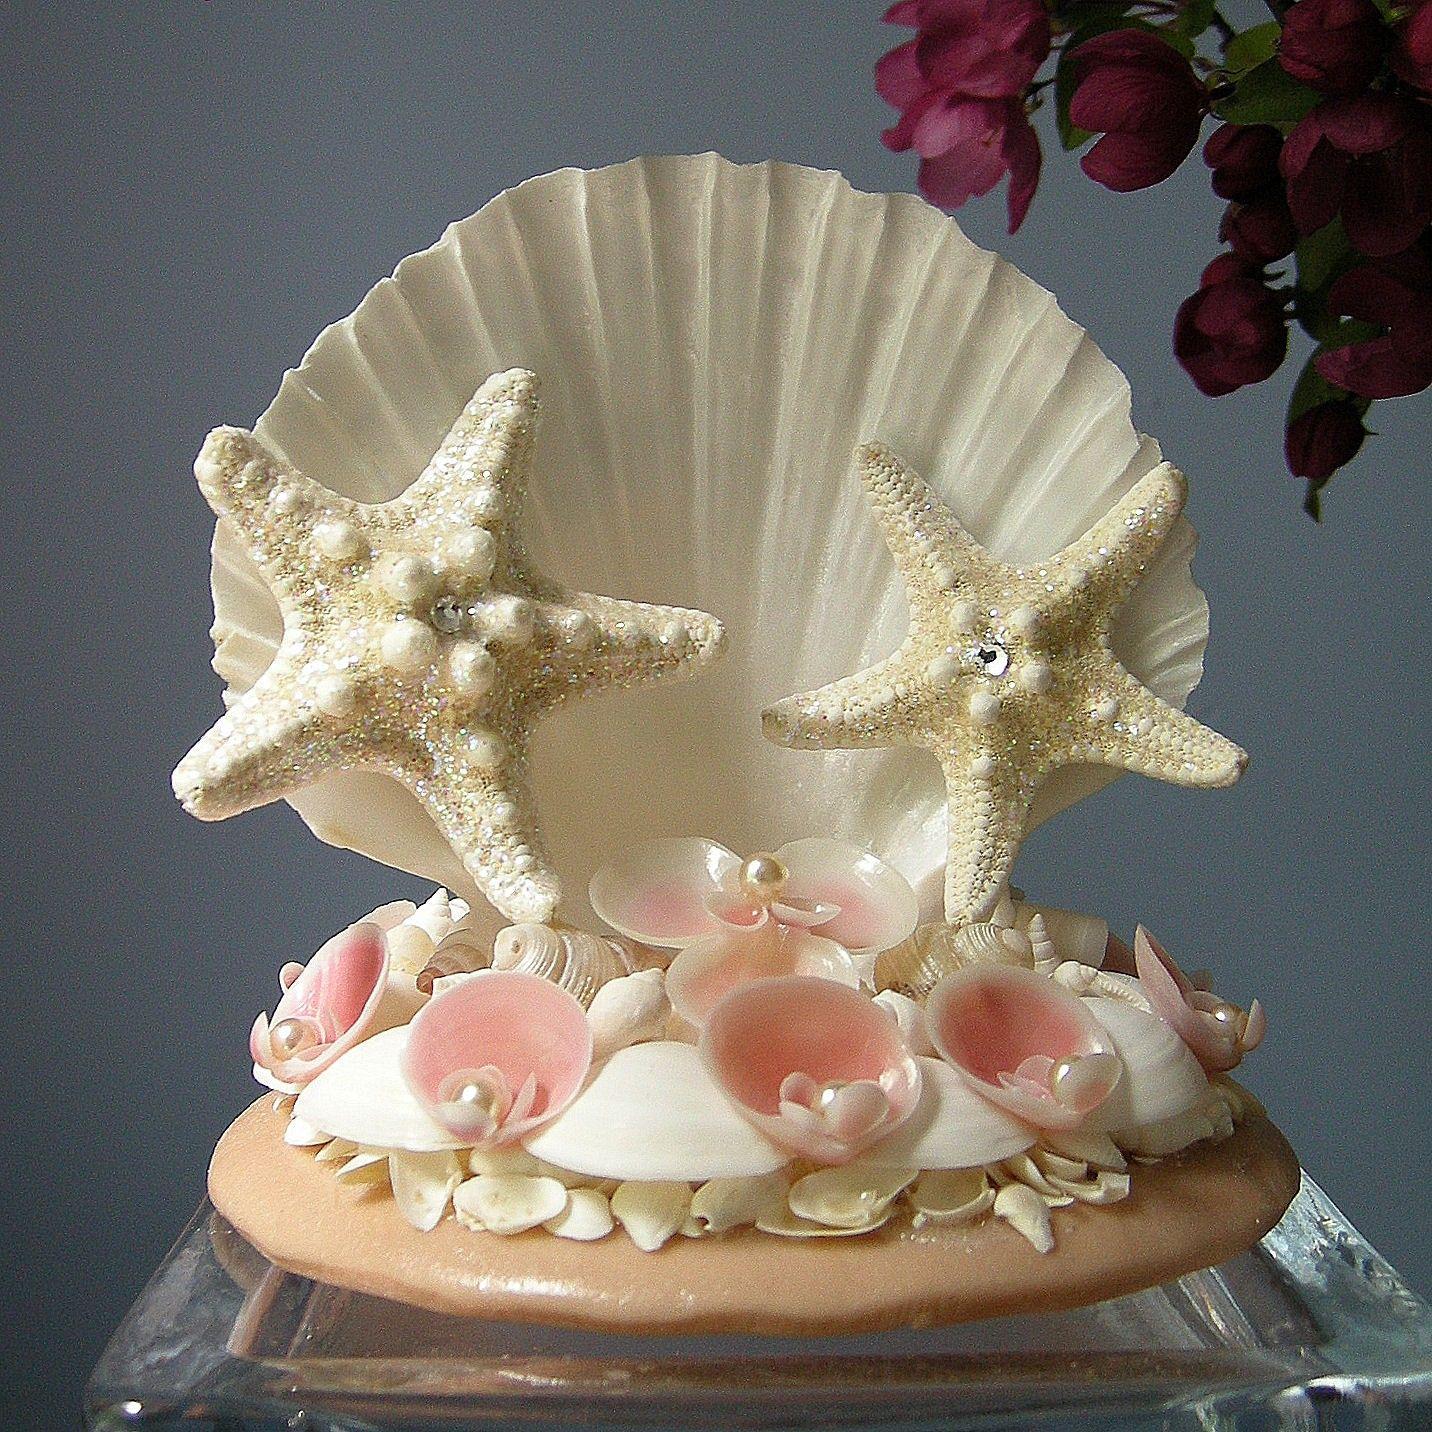 Seashell Topped Wedding Cake